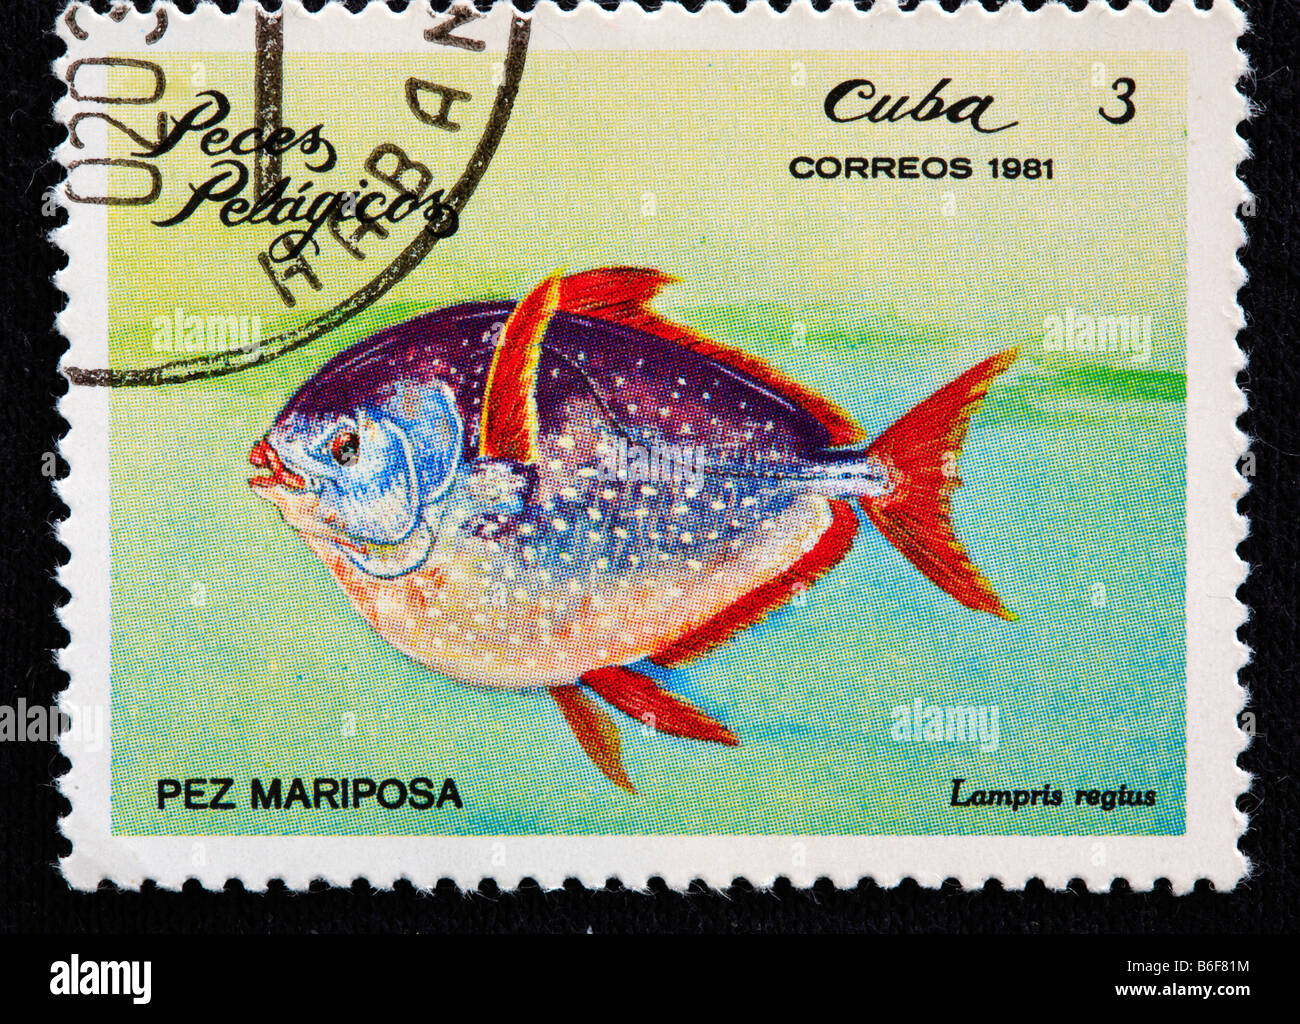 Opah Moonfish, Sonnenbarsch, Kingfish, Jerusalem Schellfisch (Lampris Guttatus), Briefmarke, Kuba, 1981 Stockfoto